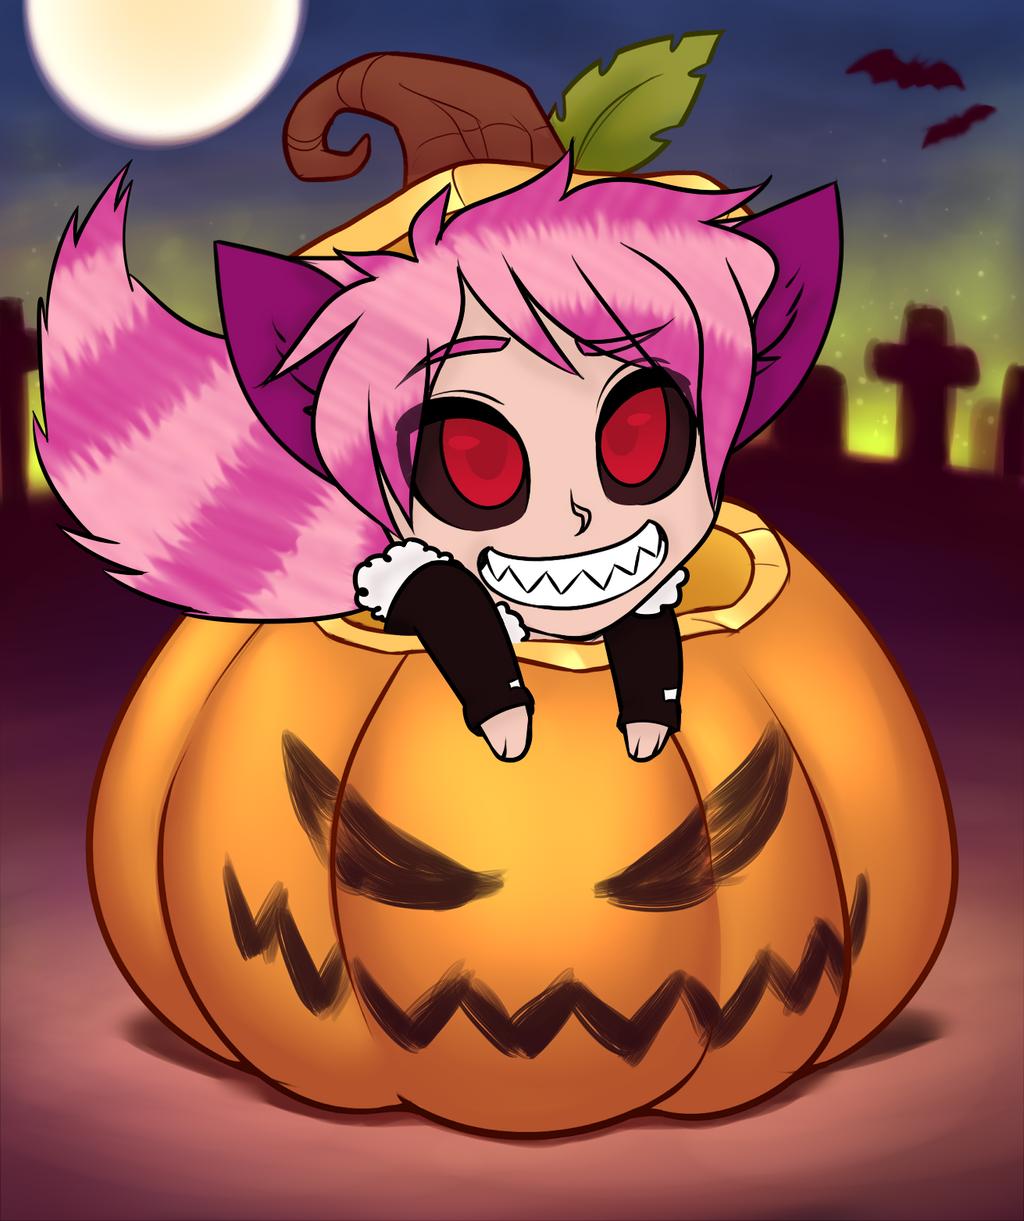 Belphagor in a pumpkin by RoseandherThorns